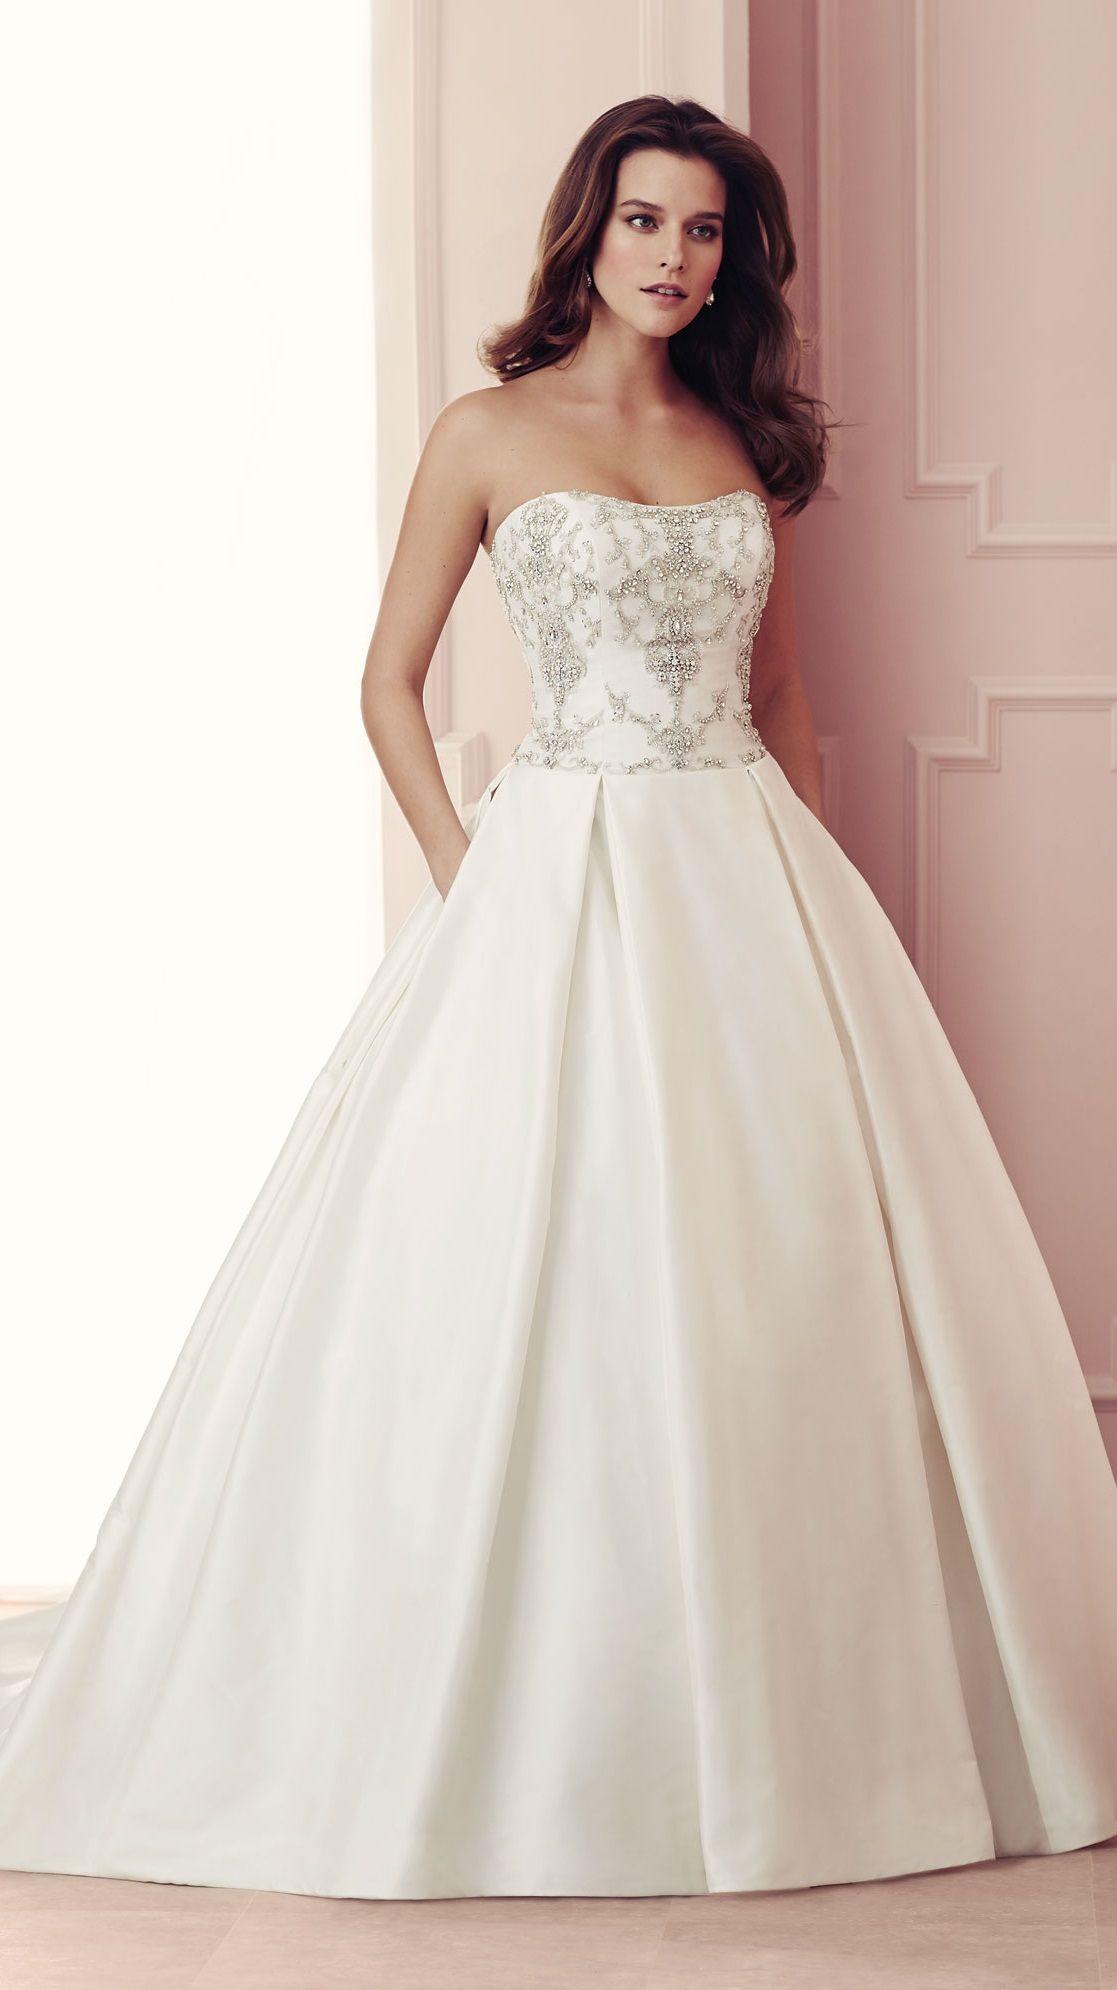 Wedding dresses com  princess wedding dress from Paloma Blanca  Disney Princess Wedding